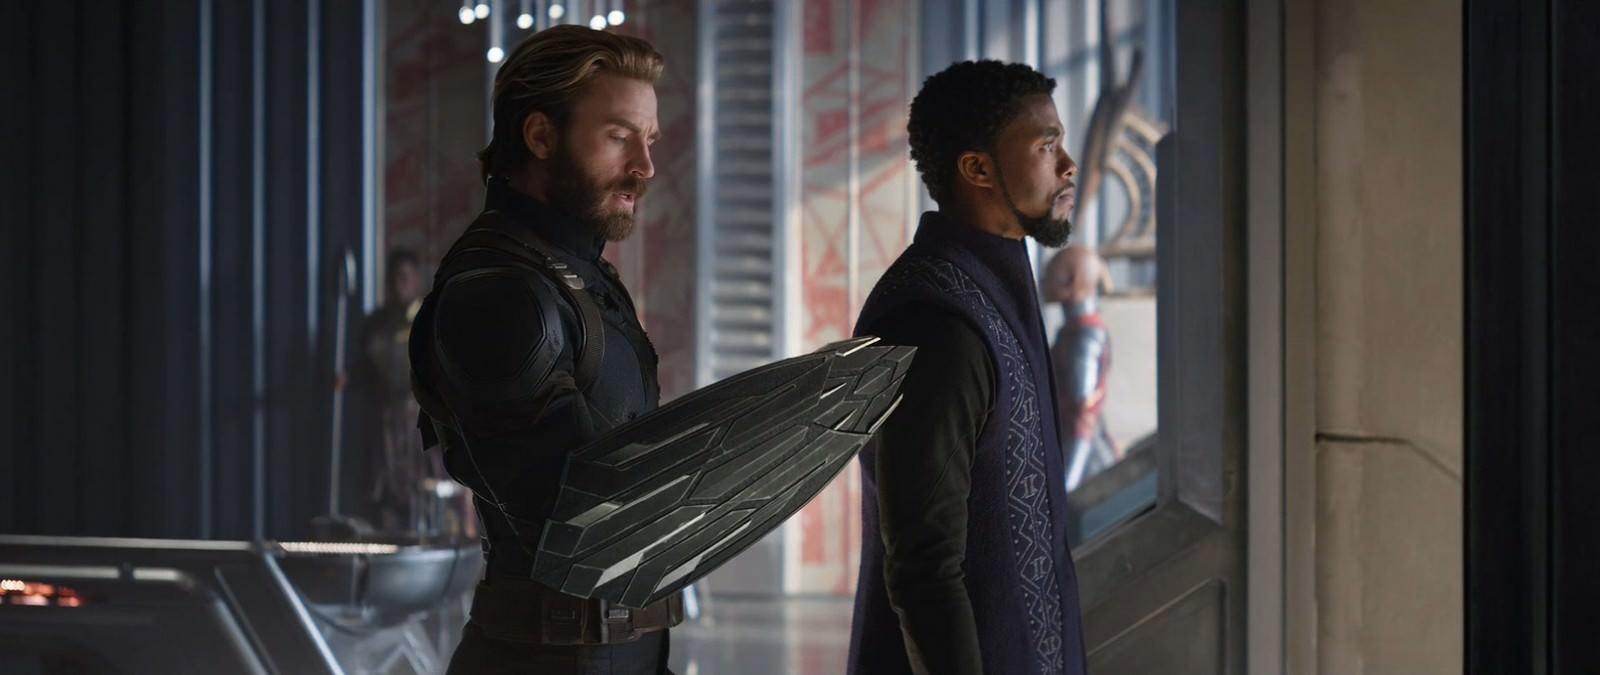 Movie, Avengers: Infinity War(美國) / 復仇者聯盟:無限之戰(台) / 复仇者联盟3:无限战争(中) / 復仇者聯盟3:無限之戰(港), 電影劇照